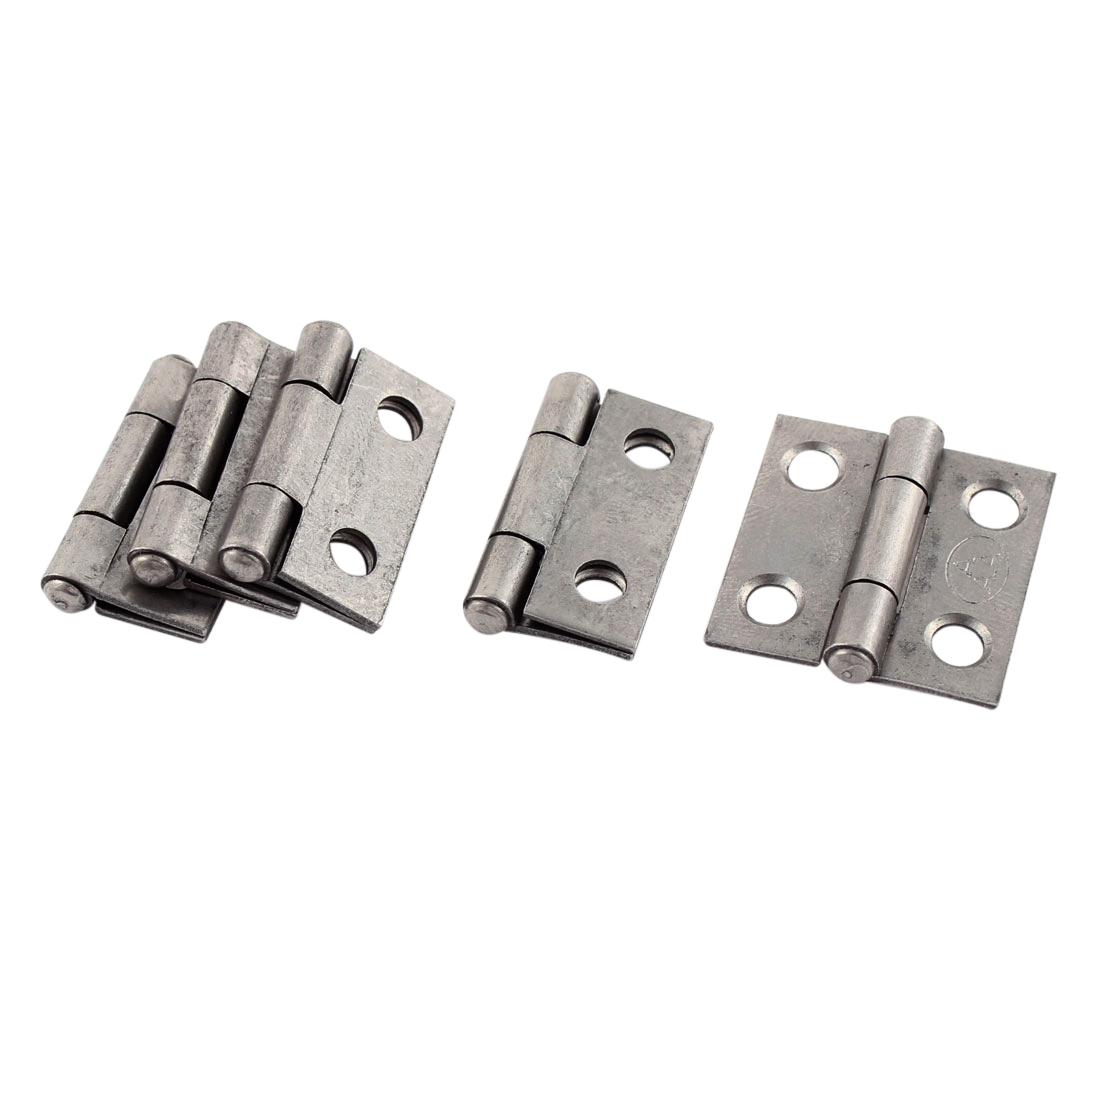 "5 Pcs Iron Cabinet Cupboard Door Gate Hinge Silver Gray 1"" Long"